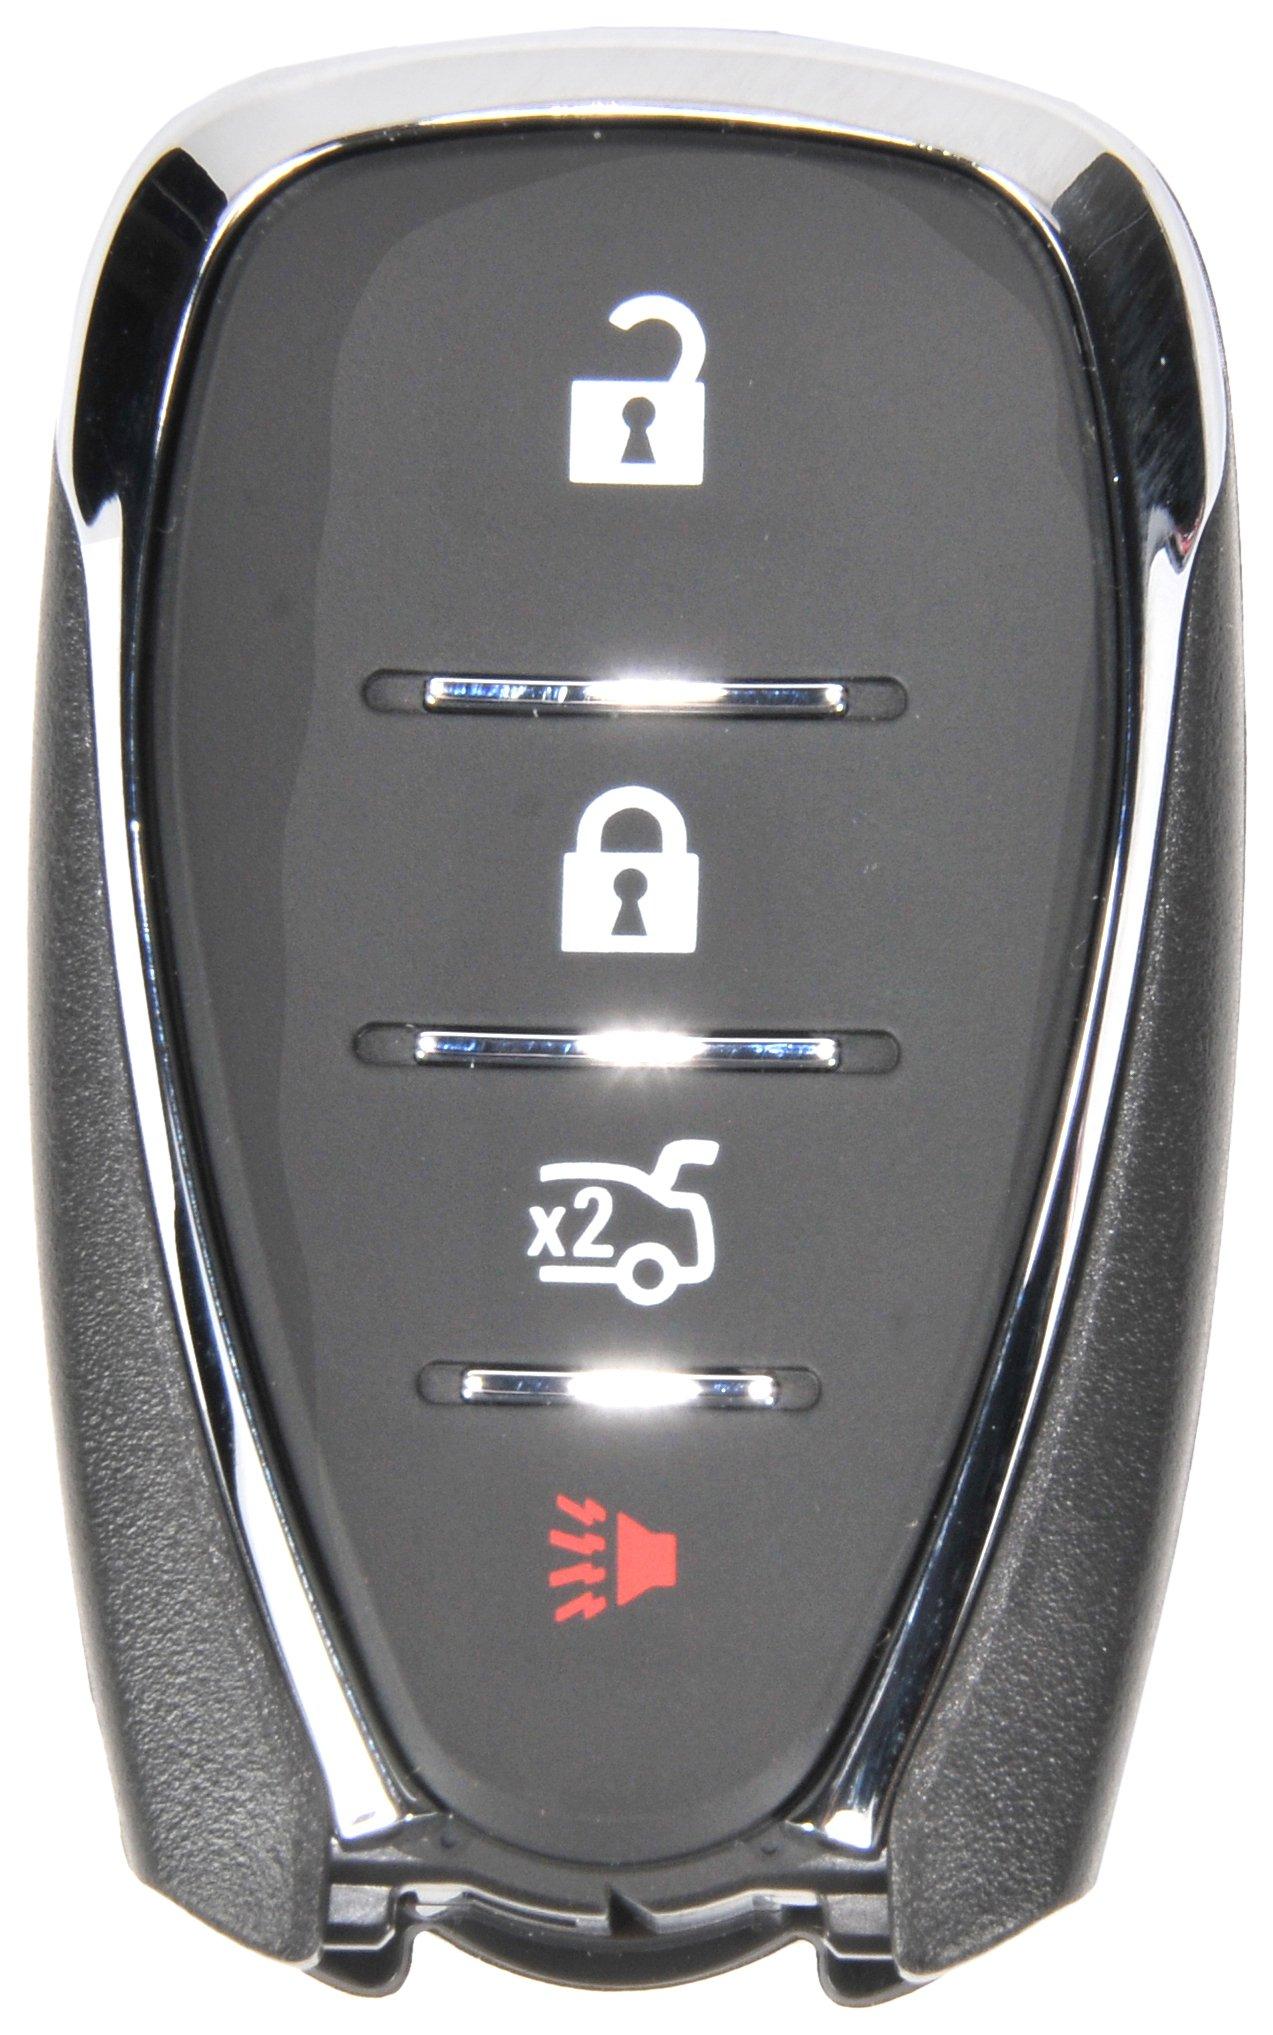 ACDelco 13508771 GM Original Equipment Keyless Entry Remote Key Fob by ACDelco